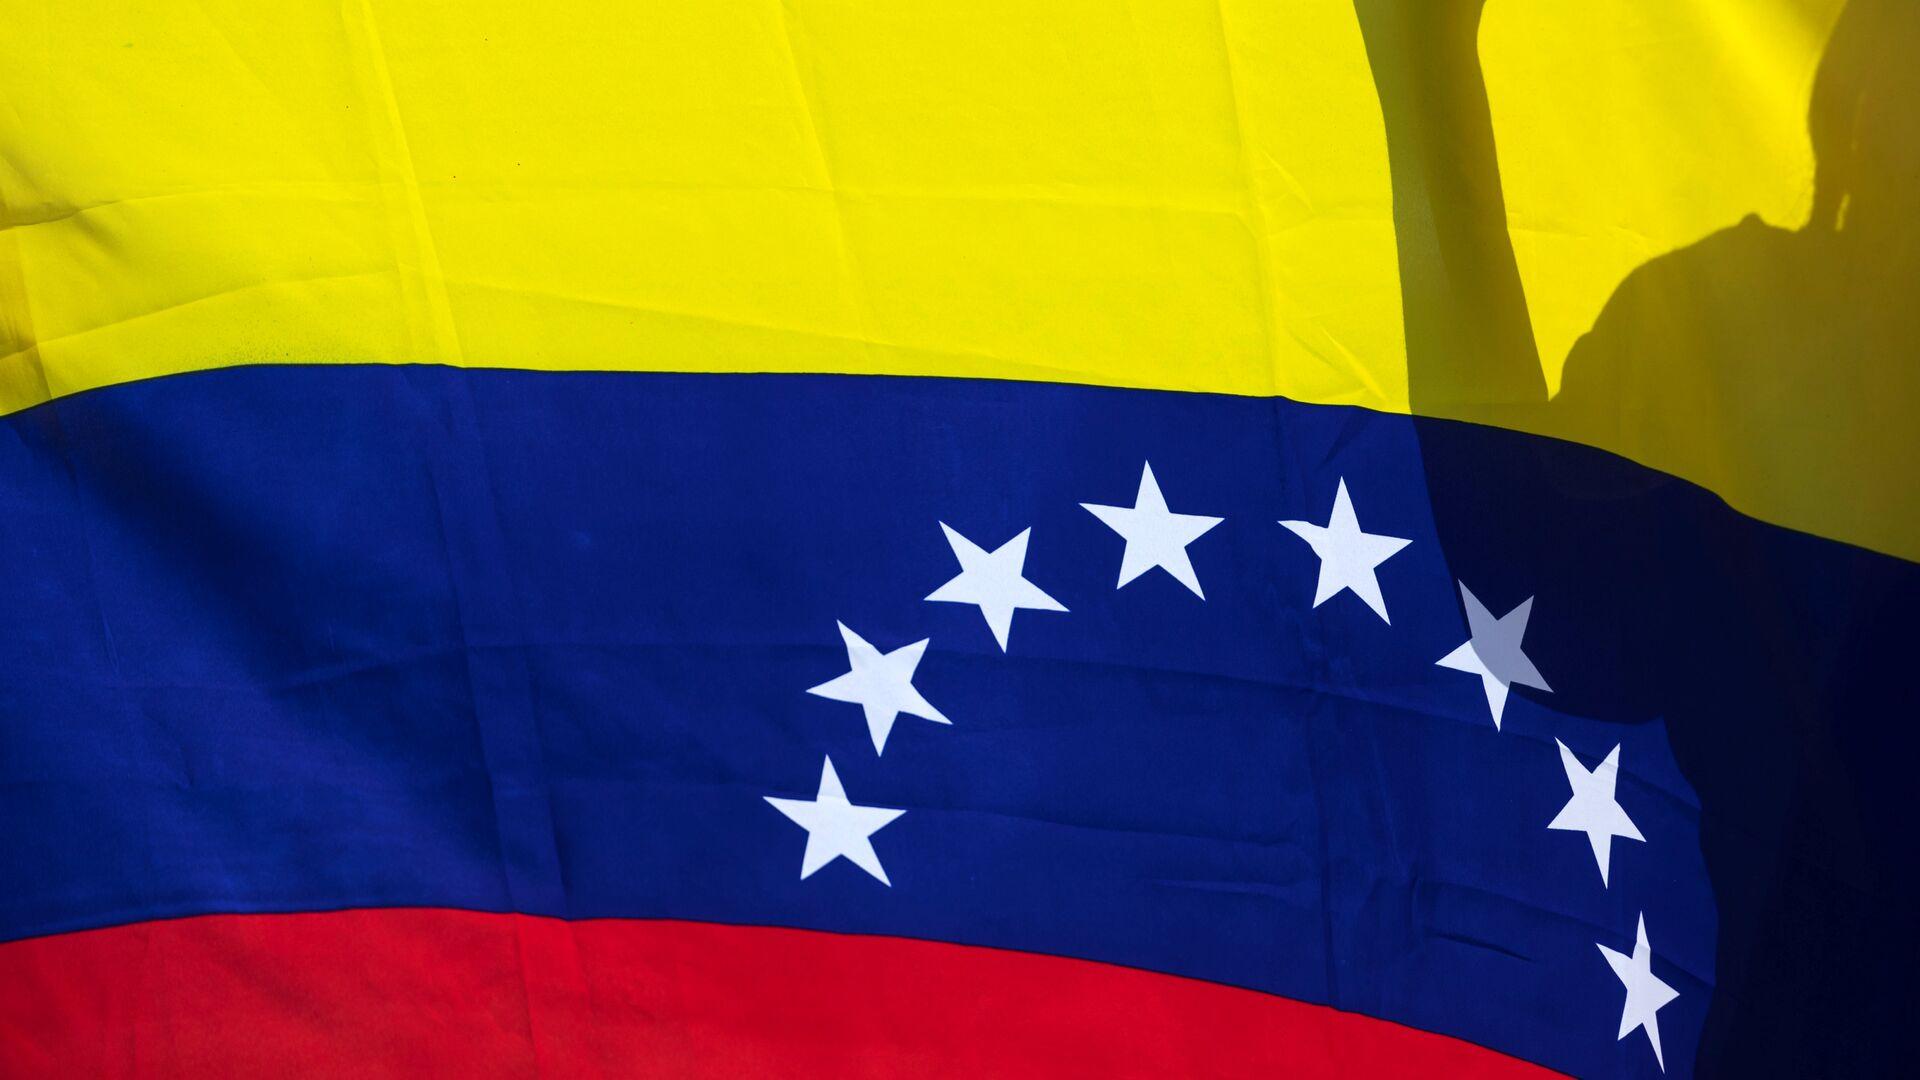 Bandera de Venezuela - Sputnik Mundo, 1920, 26.05.2021